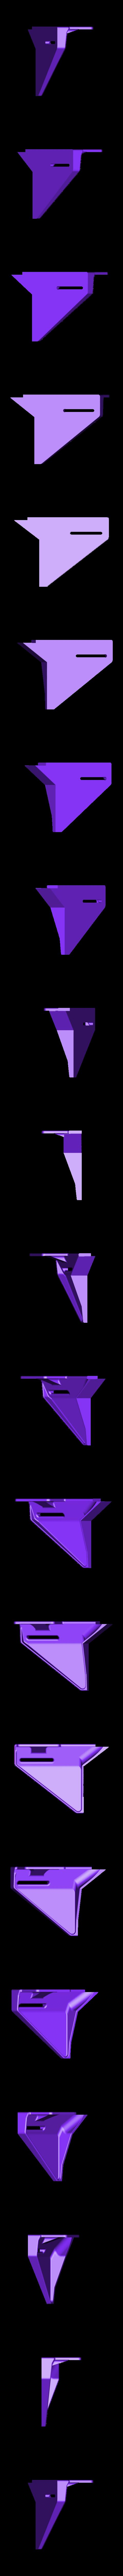 bat mount1 (1pcs).STL Download STL file Folding Quadcopter 450 Frame • 3D print object, AleksandrDolzhenko